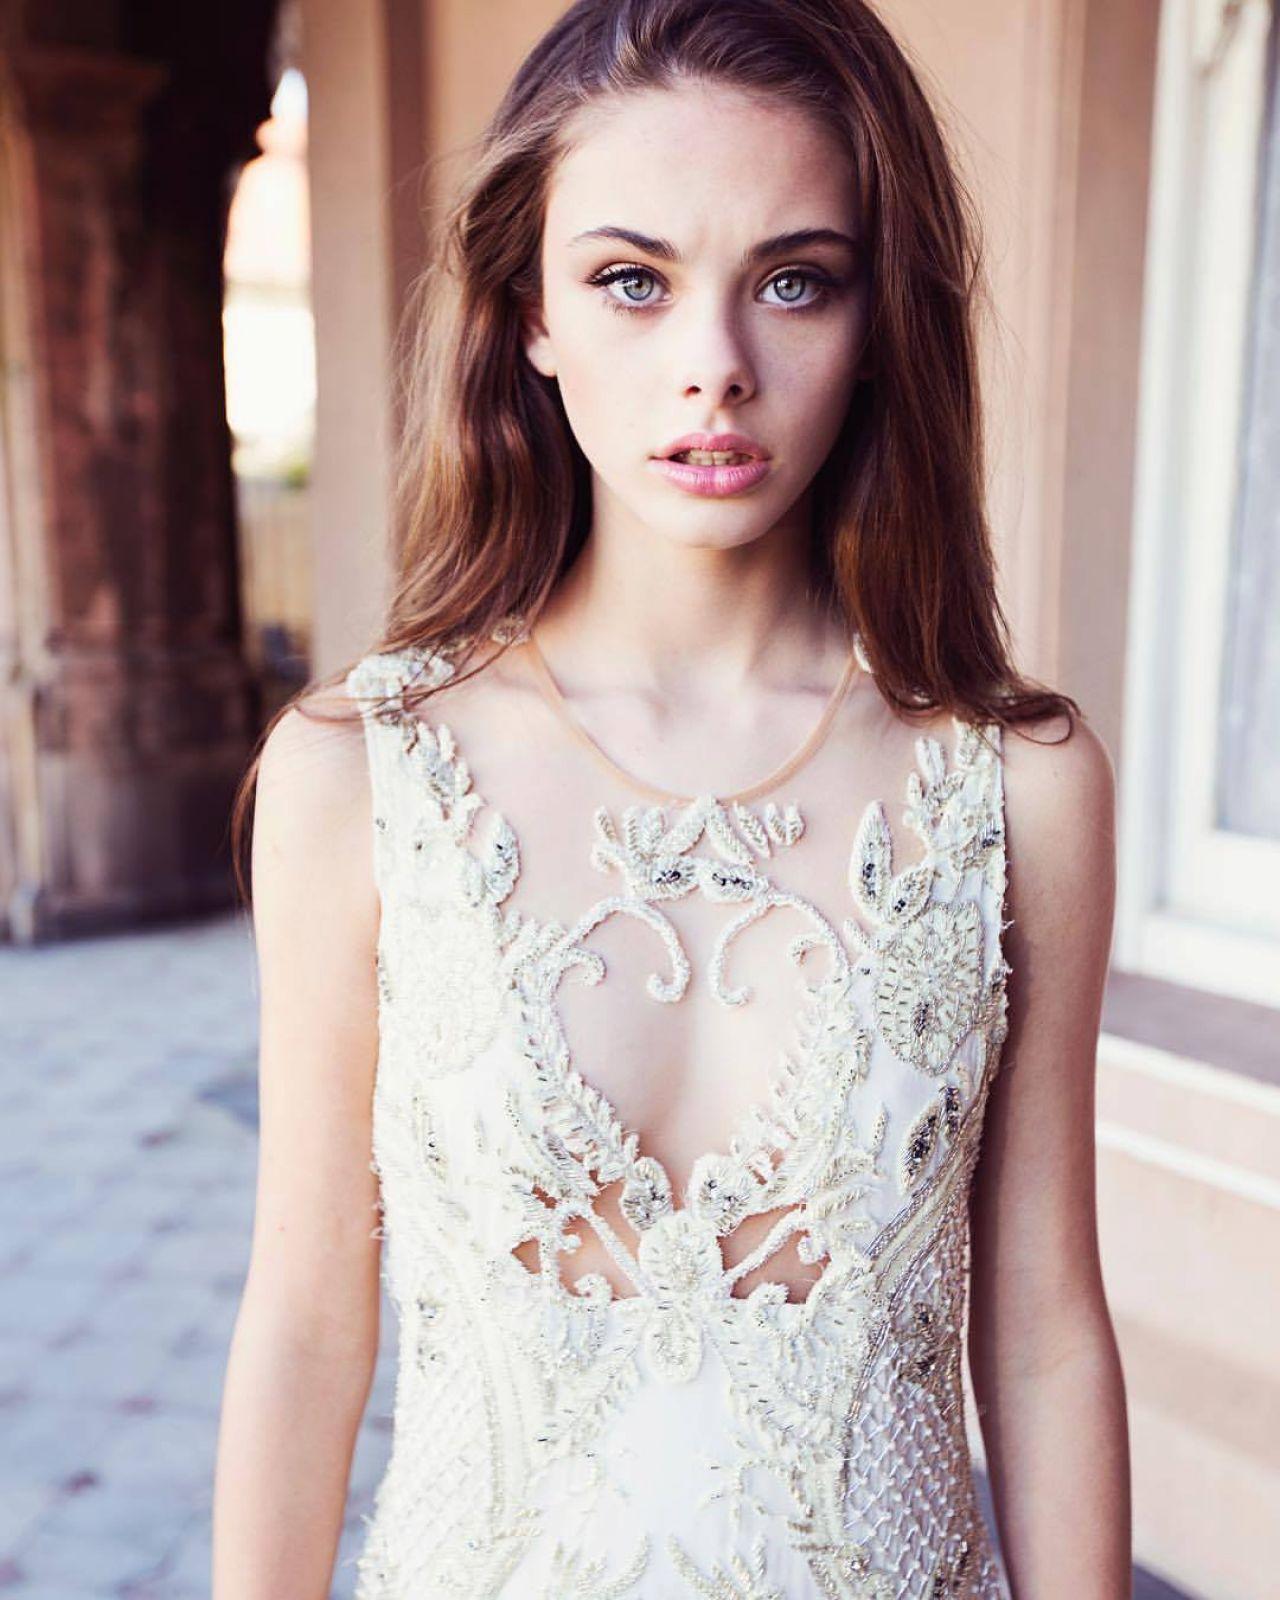 Meika Woollard Photoshoot For Couturing Com August 2017